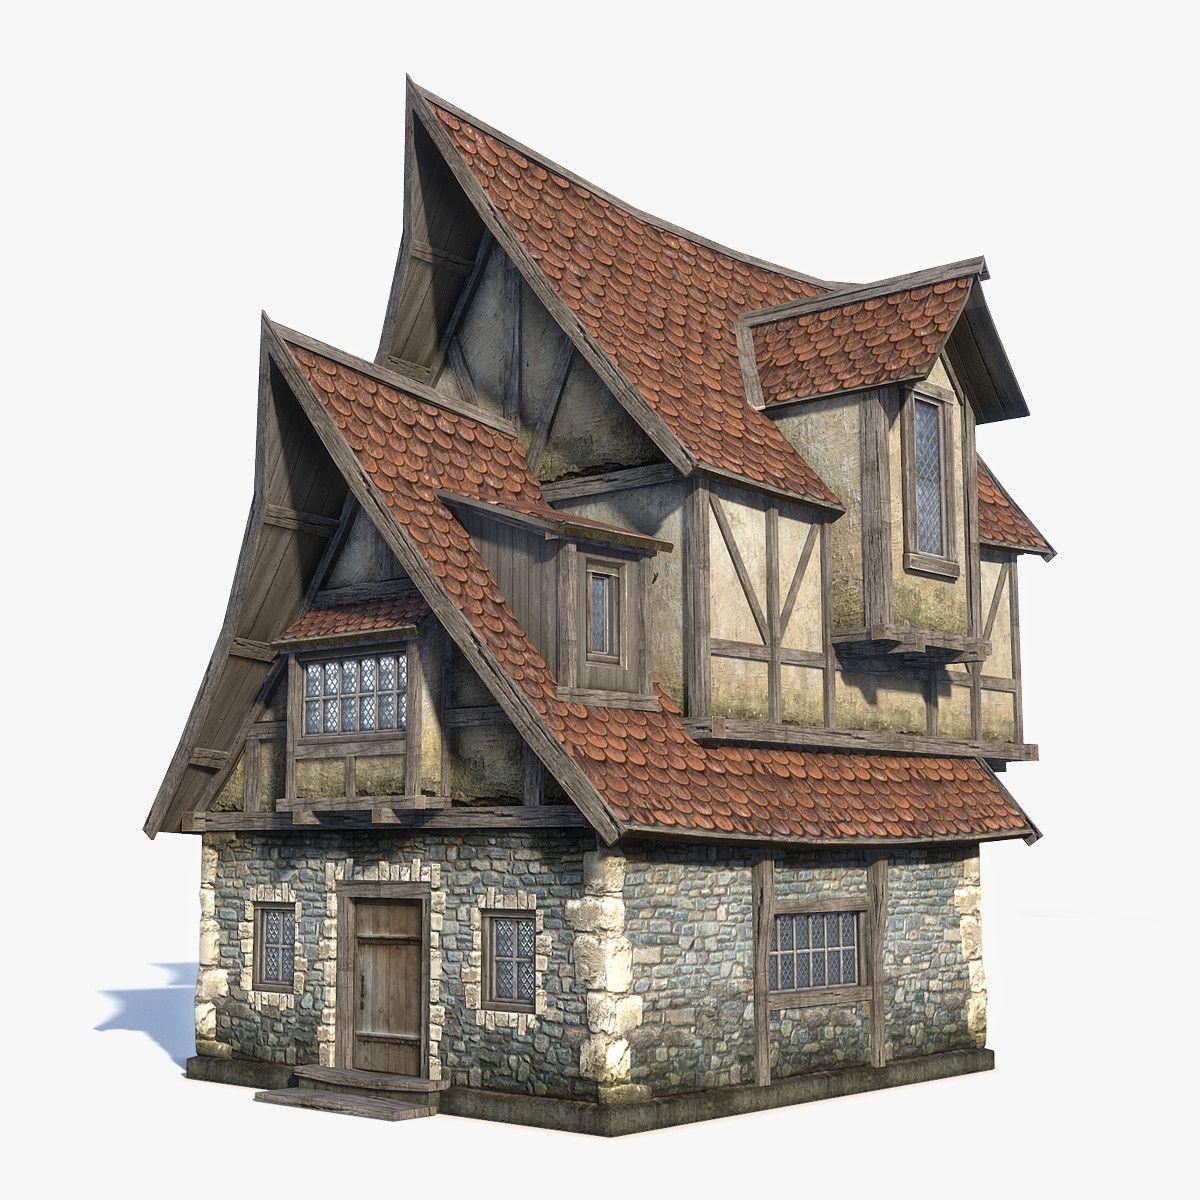 Maison En Ruine Dessin stock game low-poly 3d-model of fantasy / medieval house